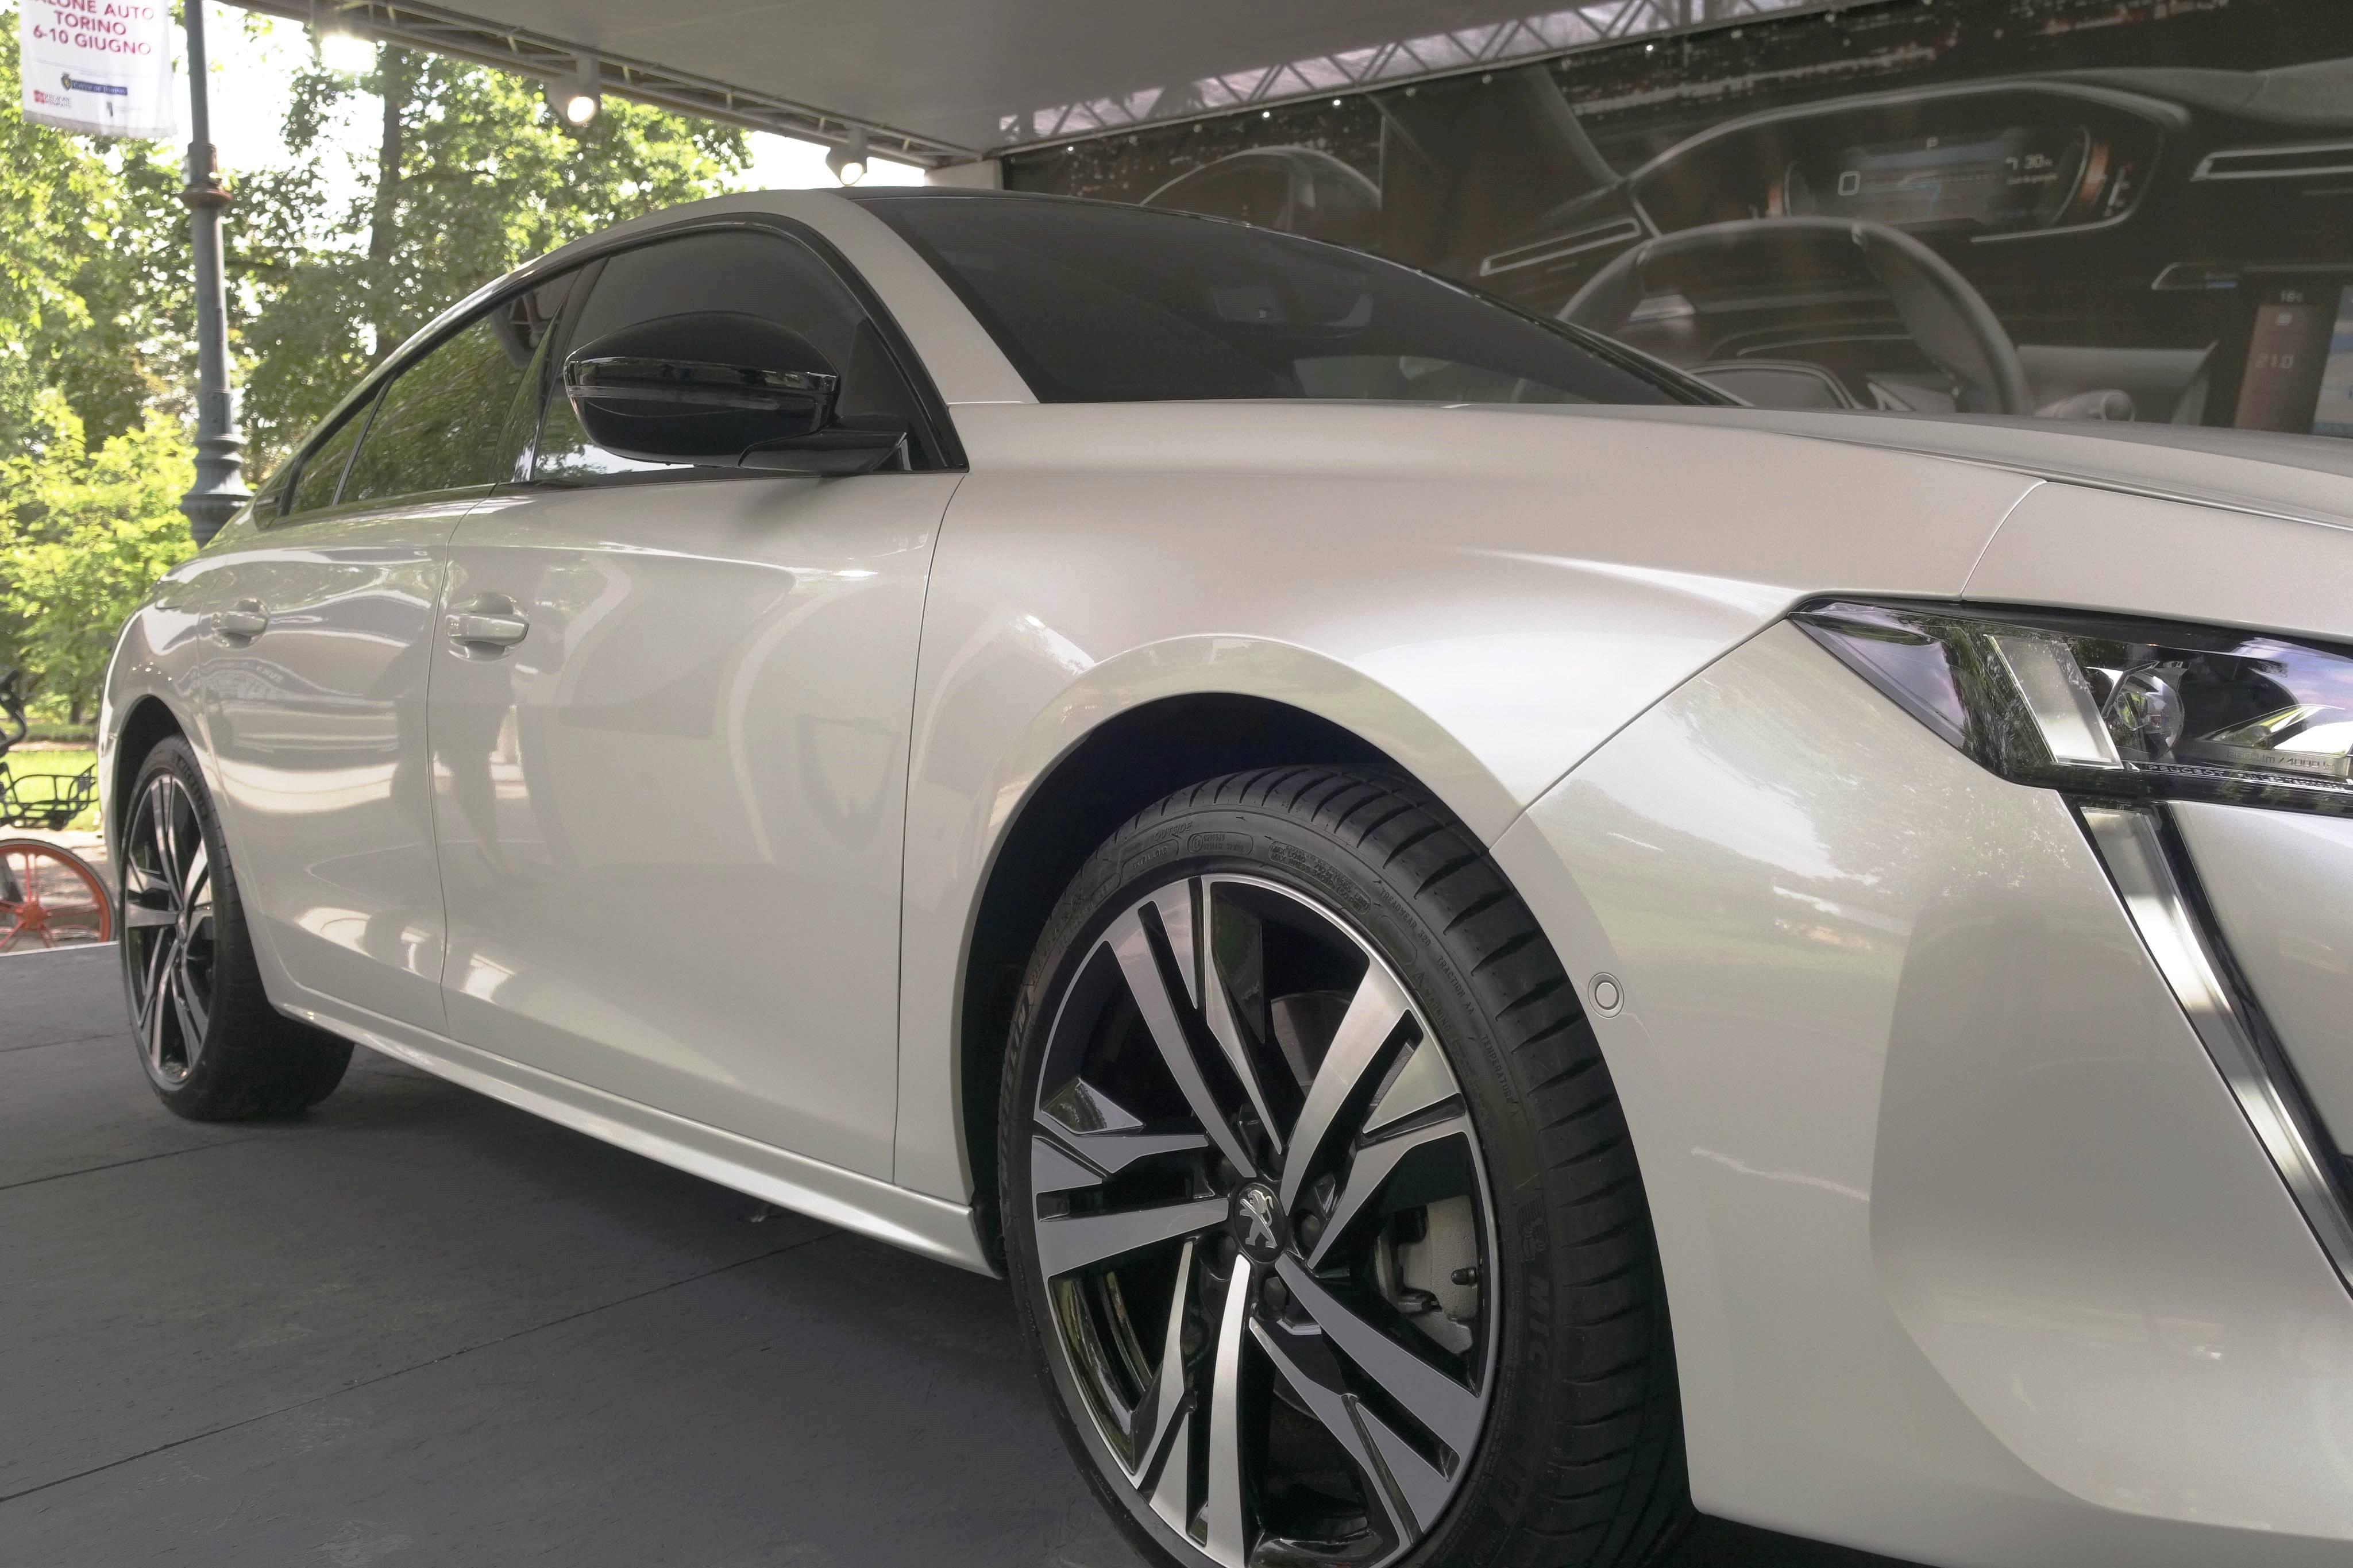 Nuova Peugeot 508 - Parco Valentino 2018